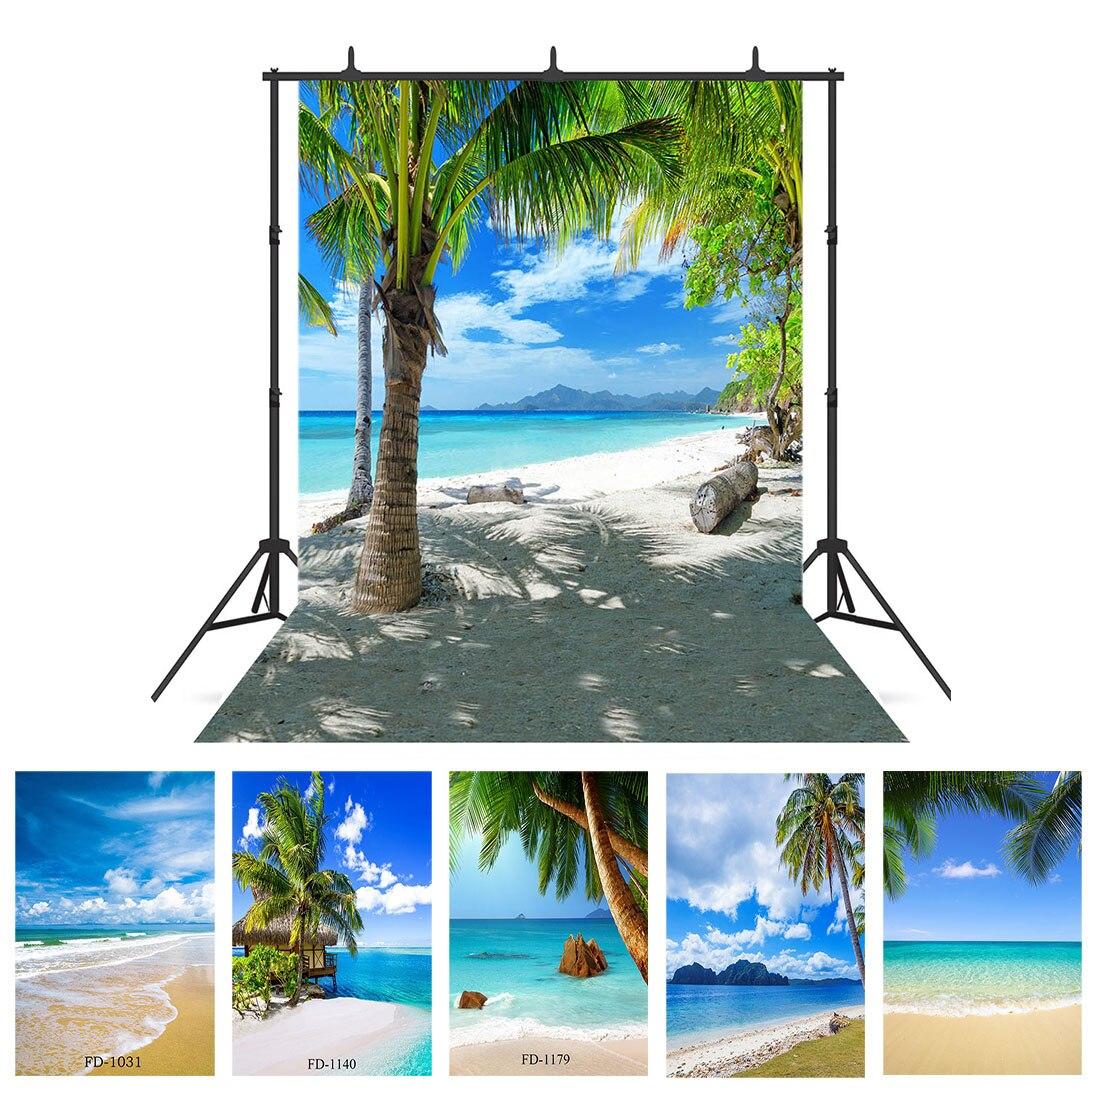 Playa de la playa palmera de fondo fotográfico para fotos Shoot Props boda niño paño de vinilo foto de fondo fotomatón